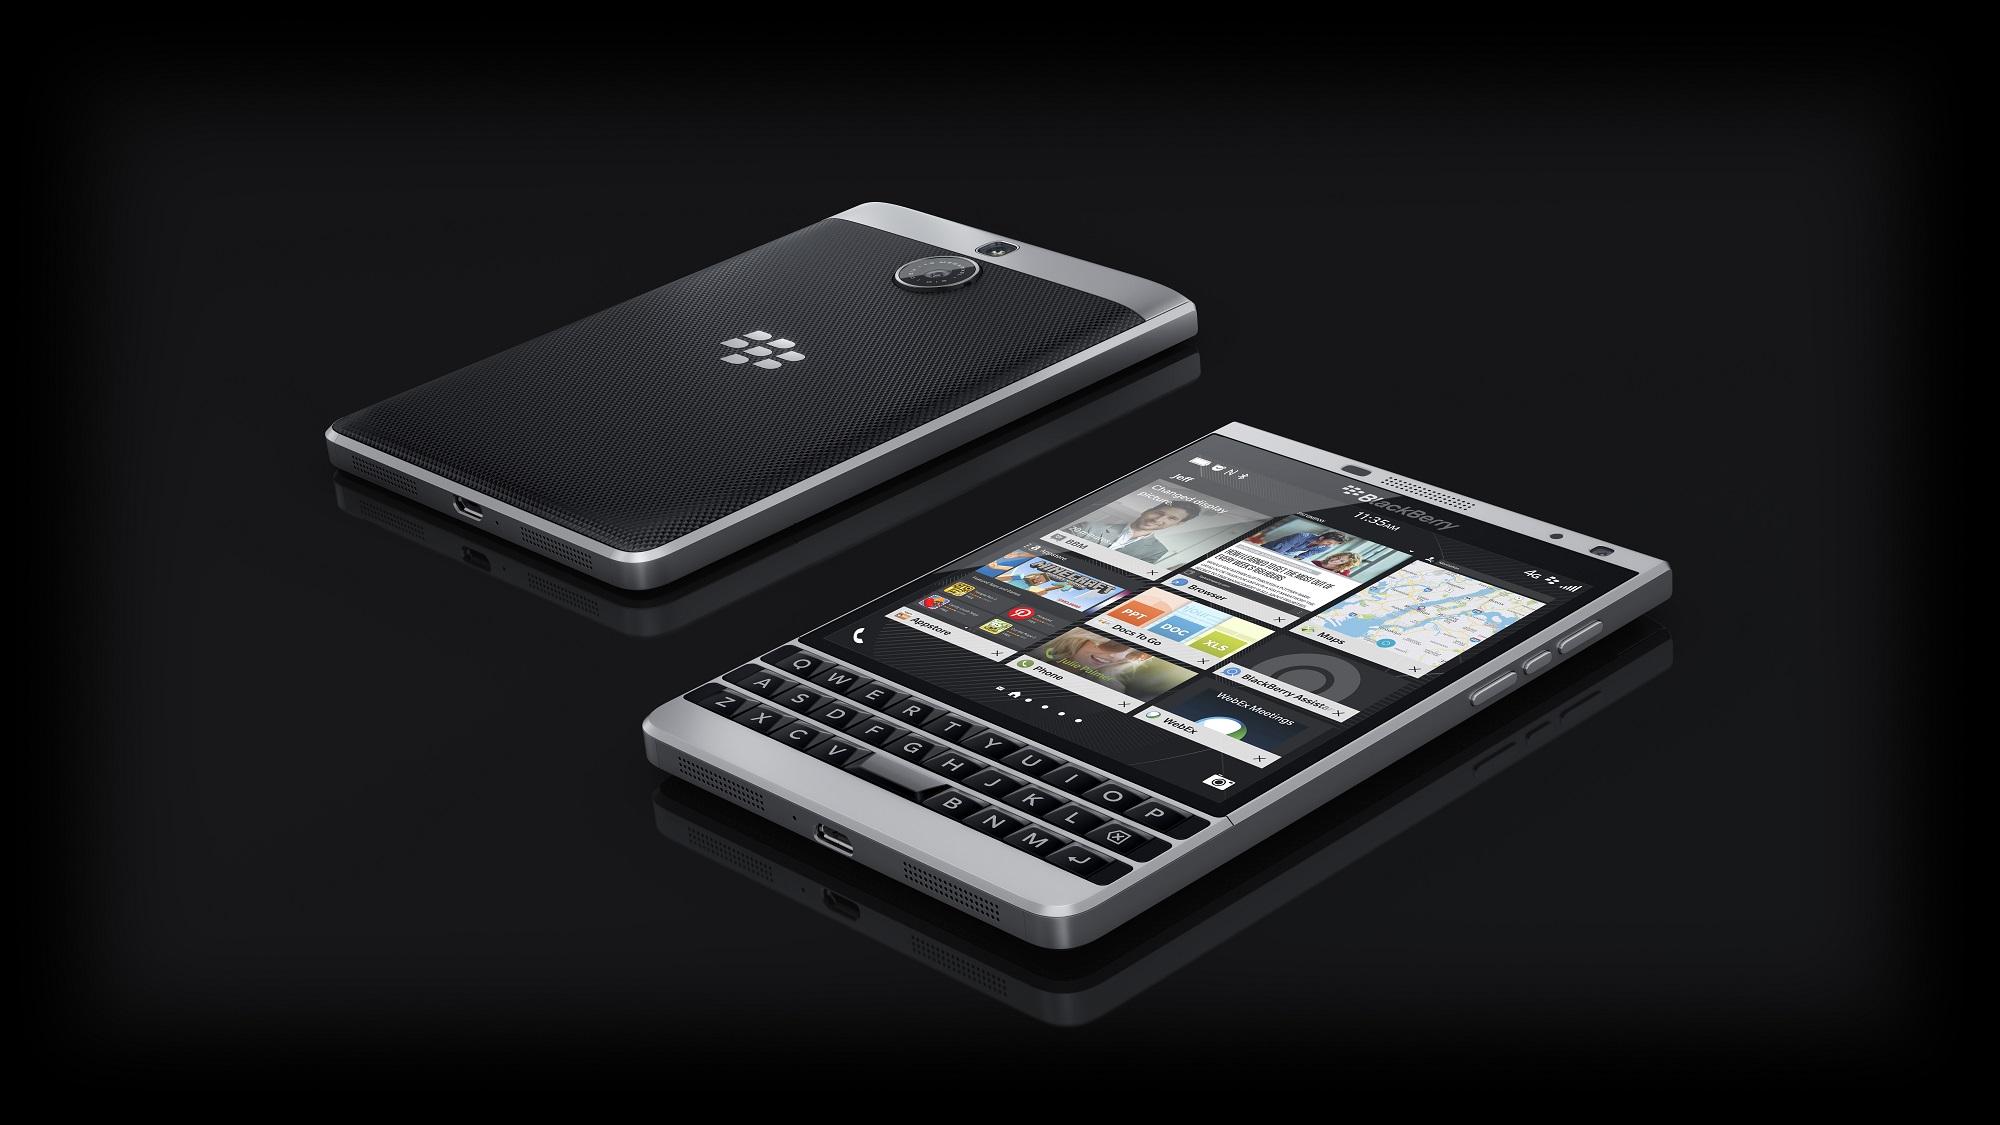 BlackBerry device.